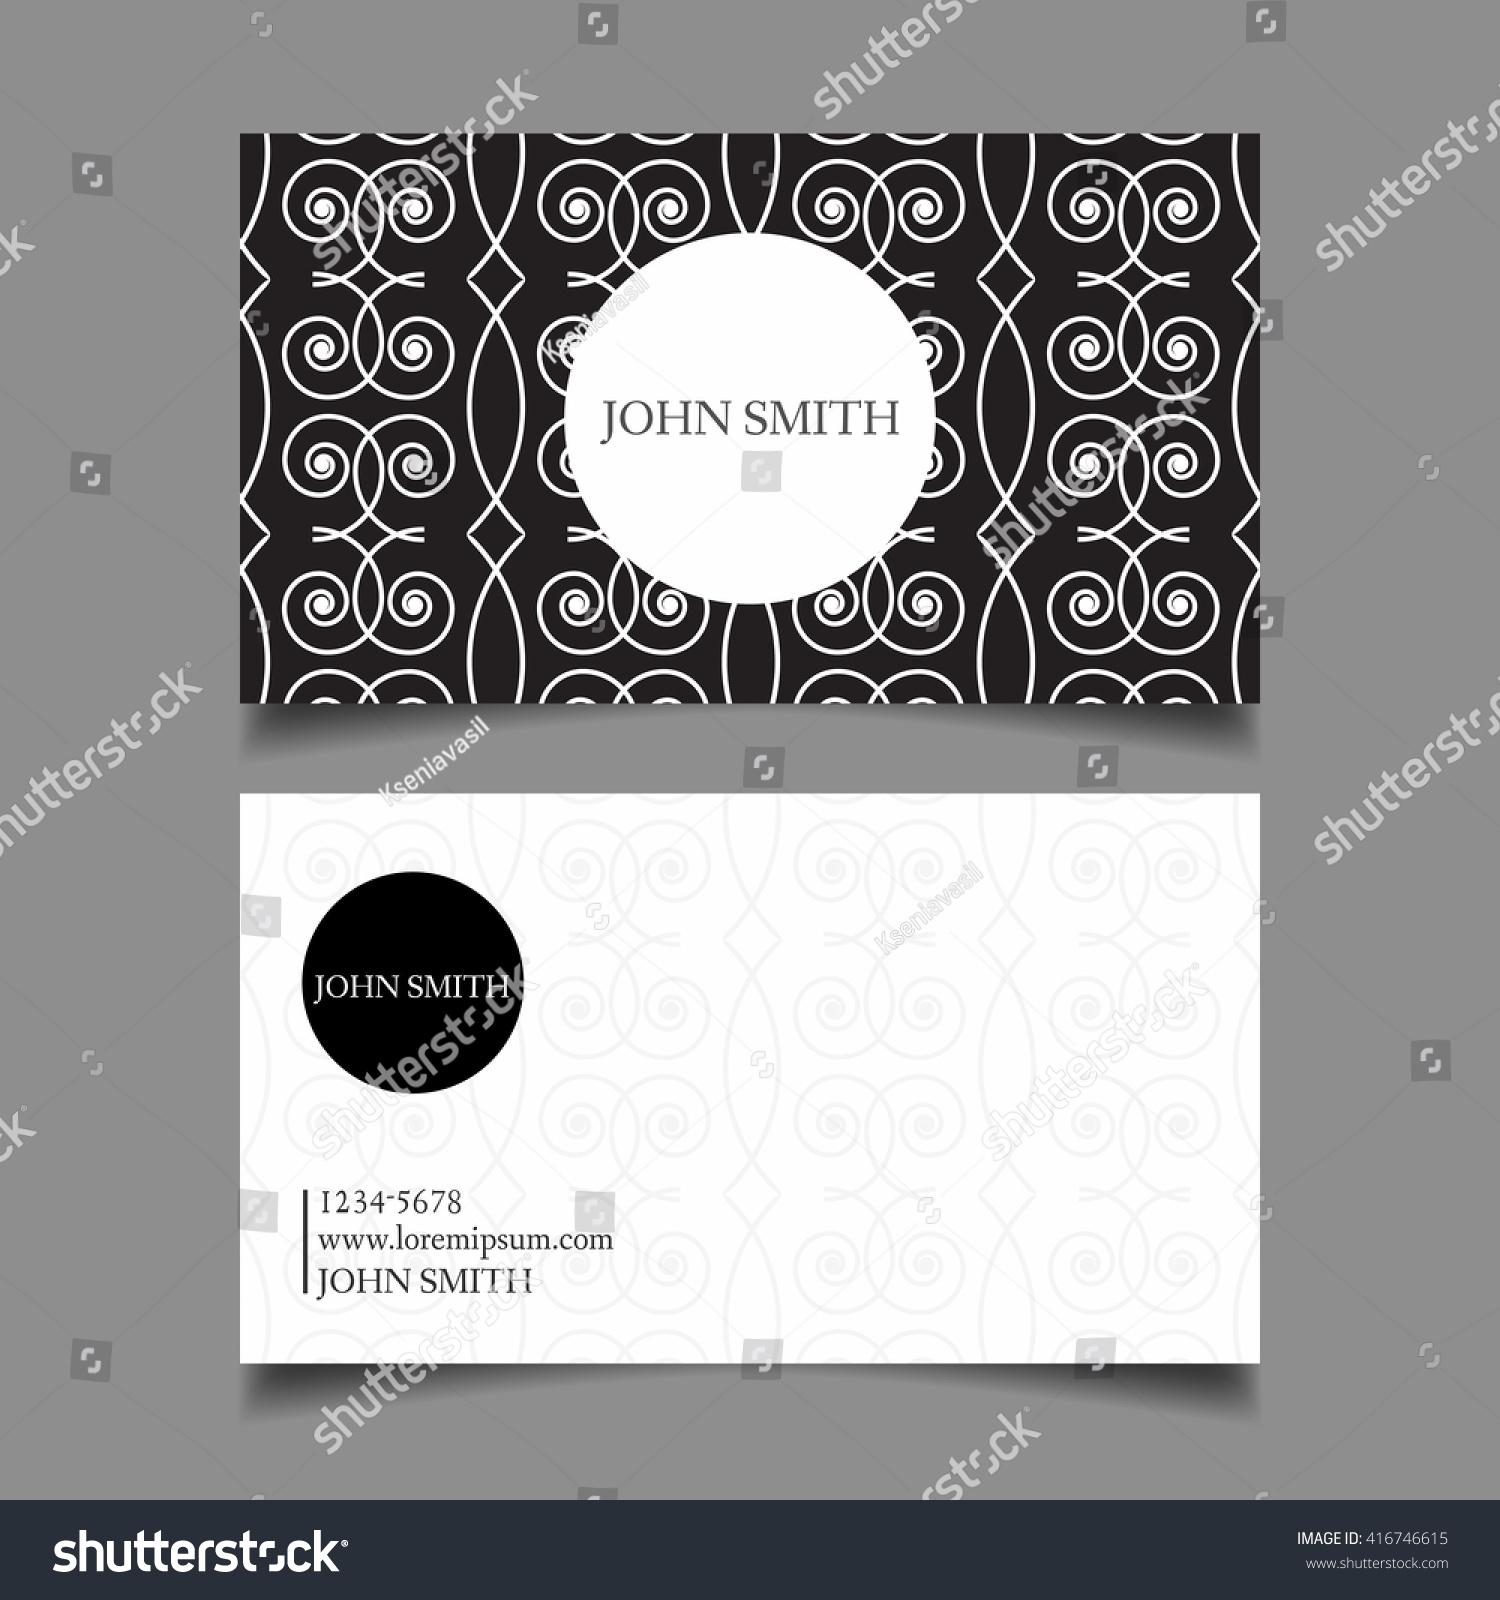 Business Card Template Editable Neat Design Stock Vector (2018 ...